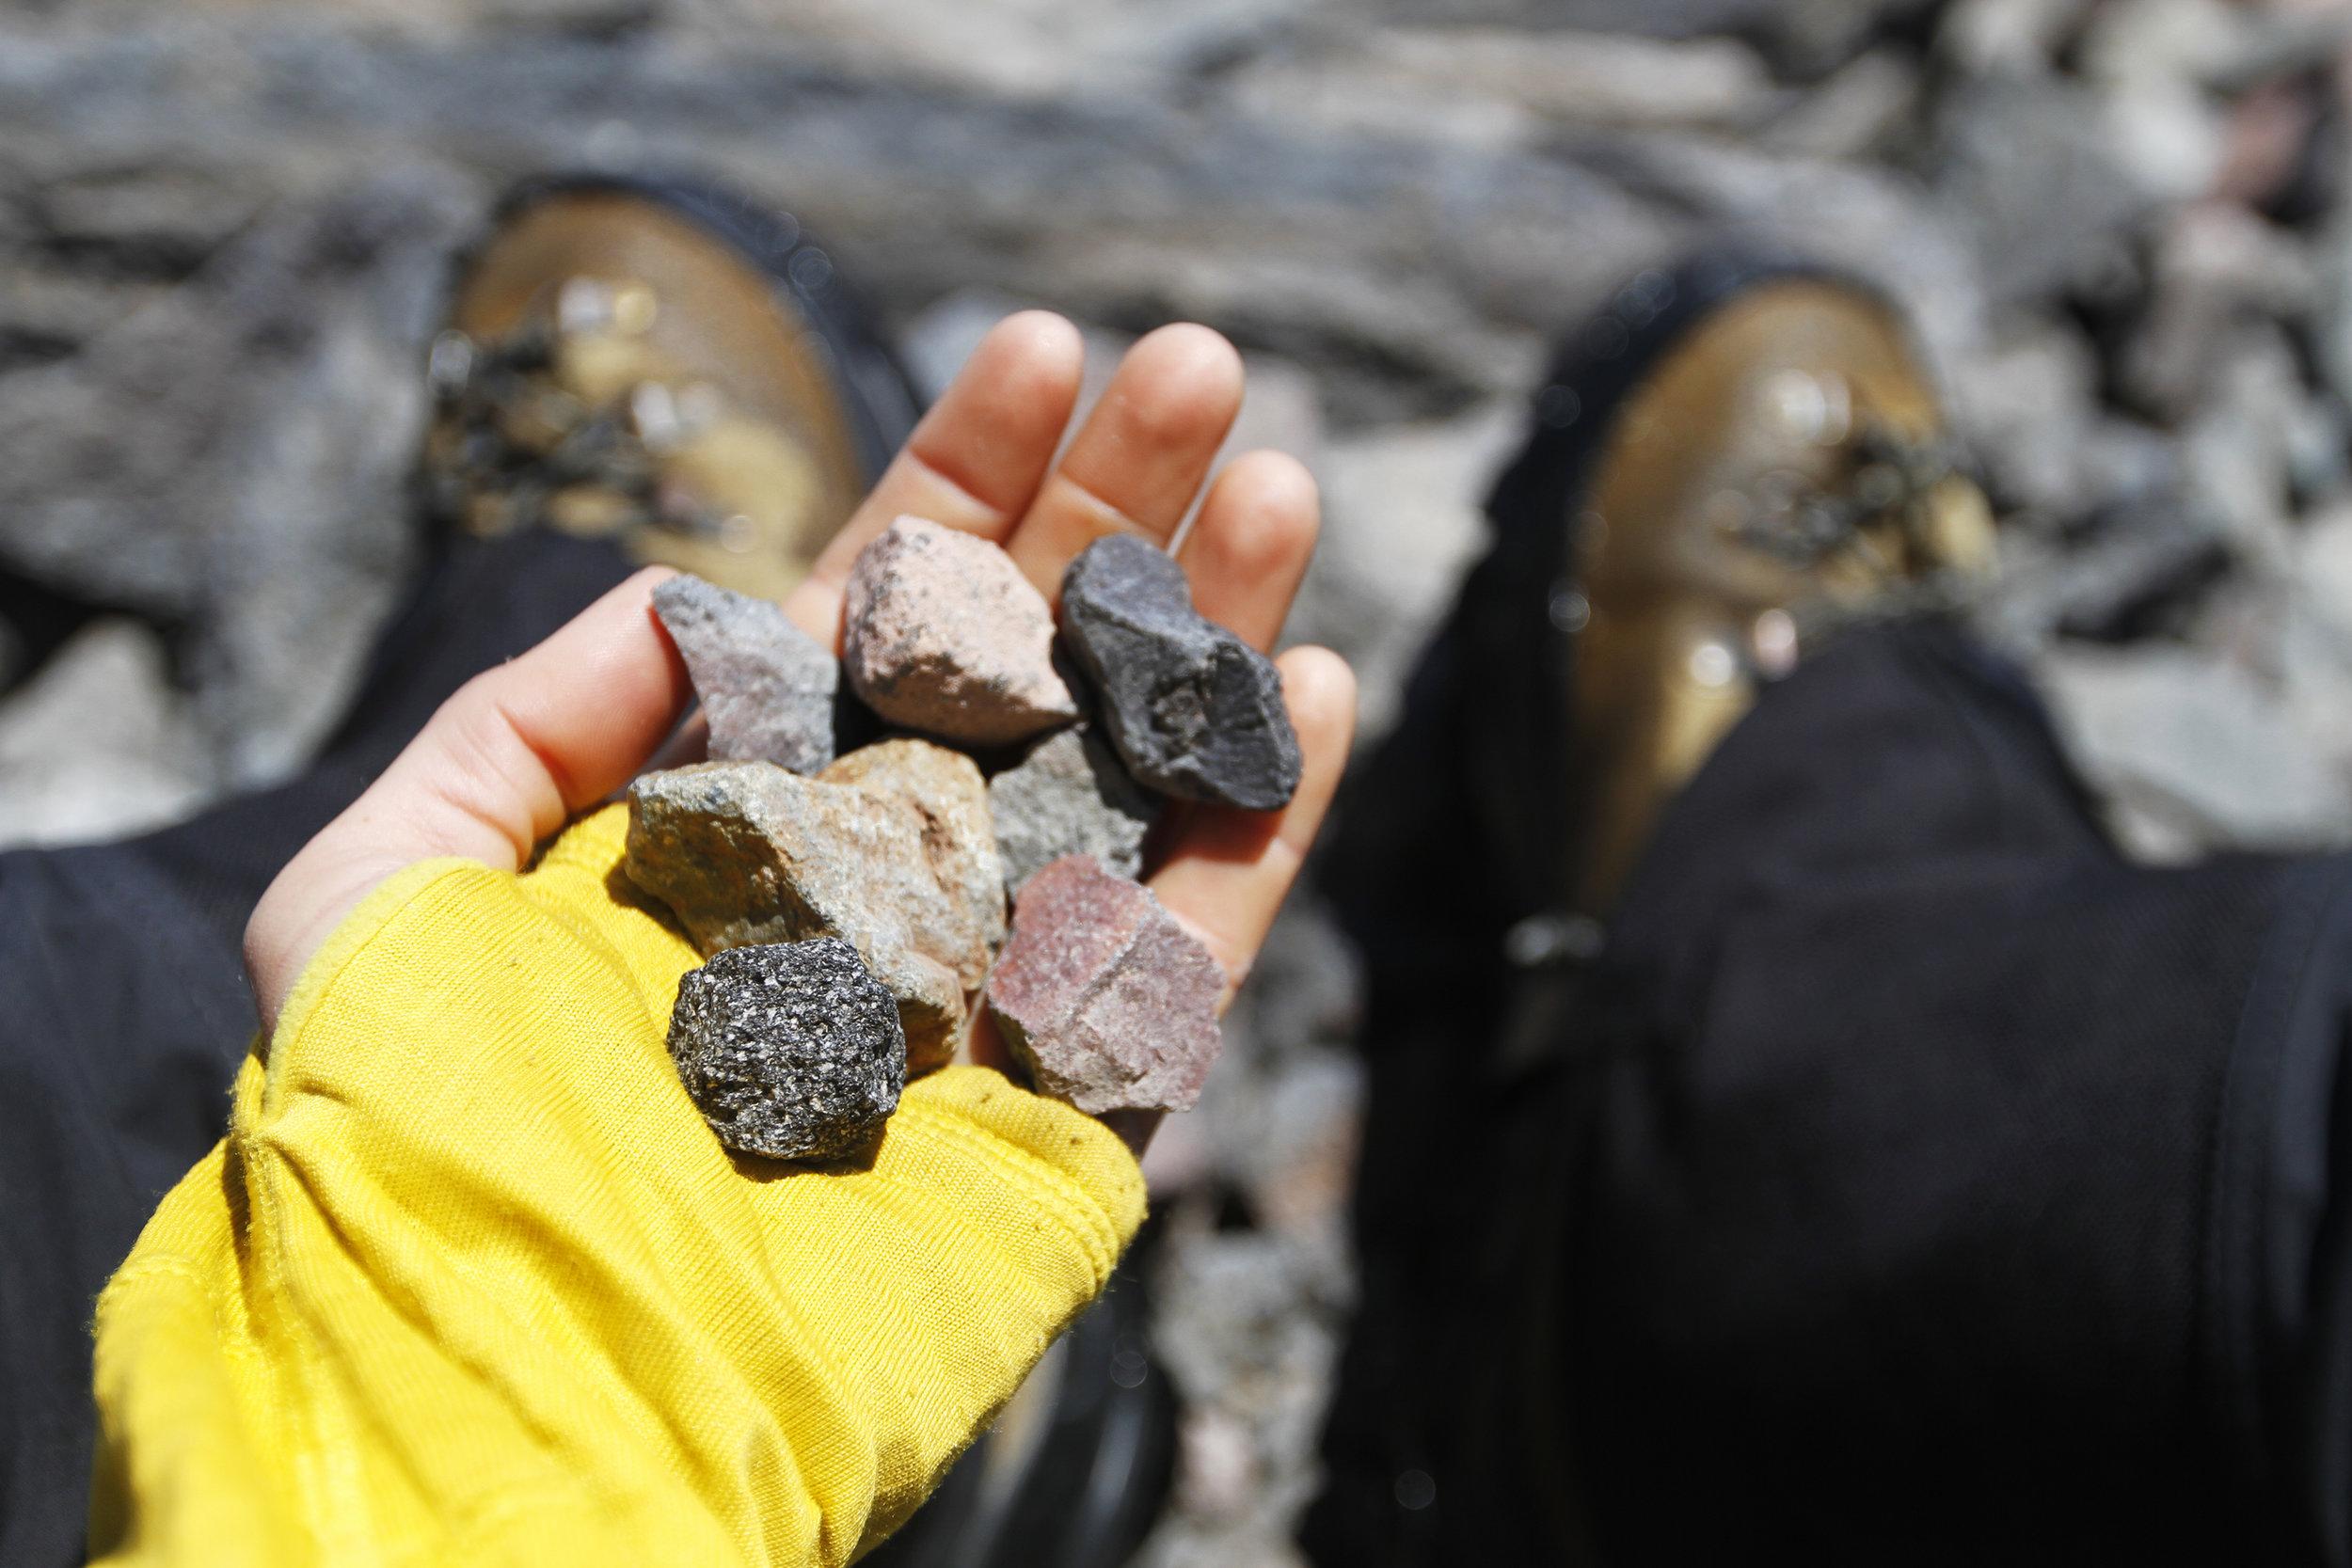 Collecting volcanic rocks while waiting on Jon.